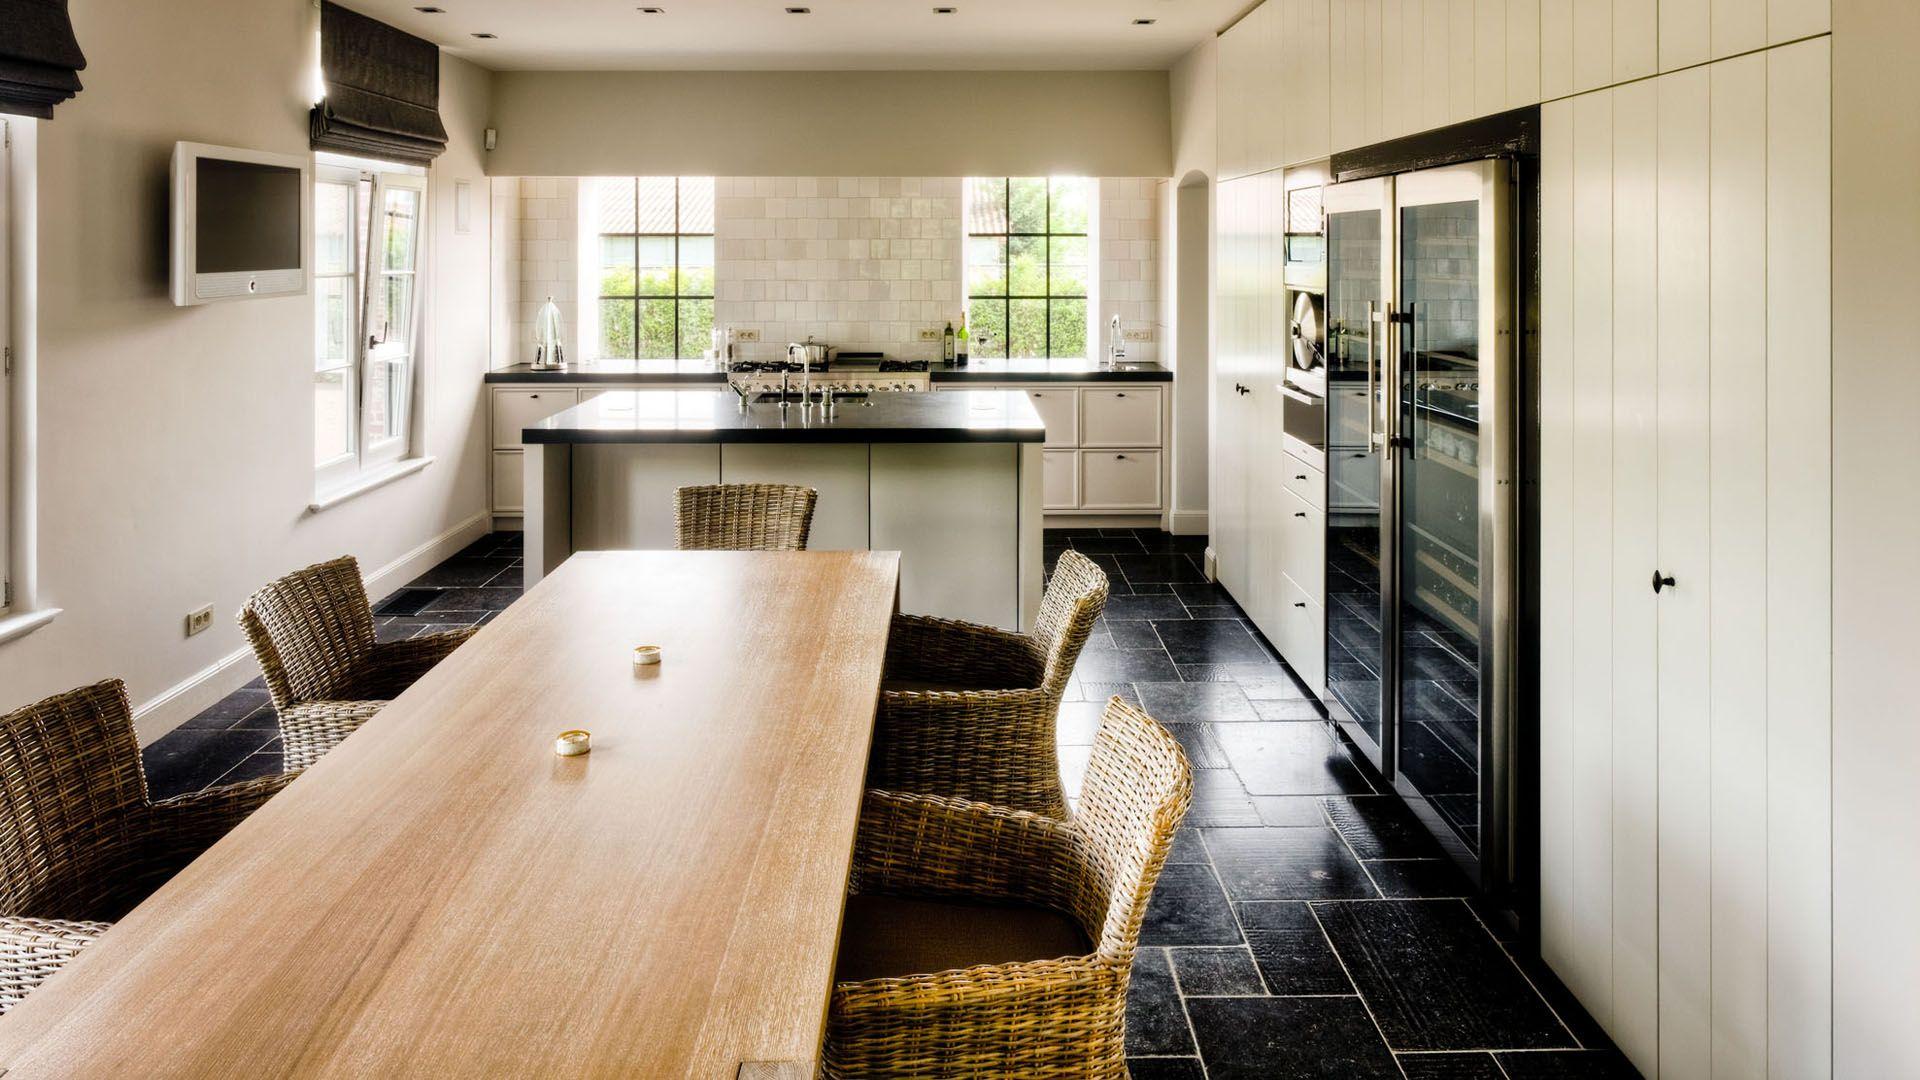 Landelijk   Kitchens   Pinterest   Kitchens, Organizations and ...